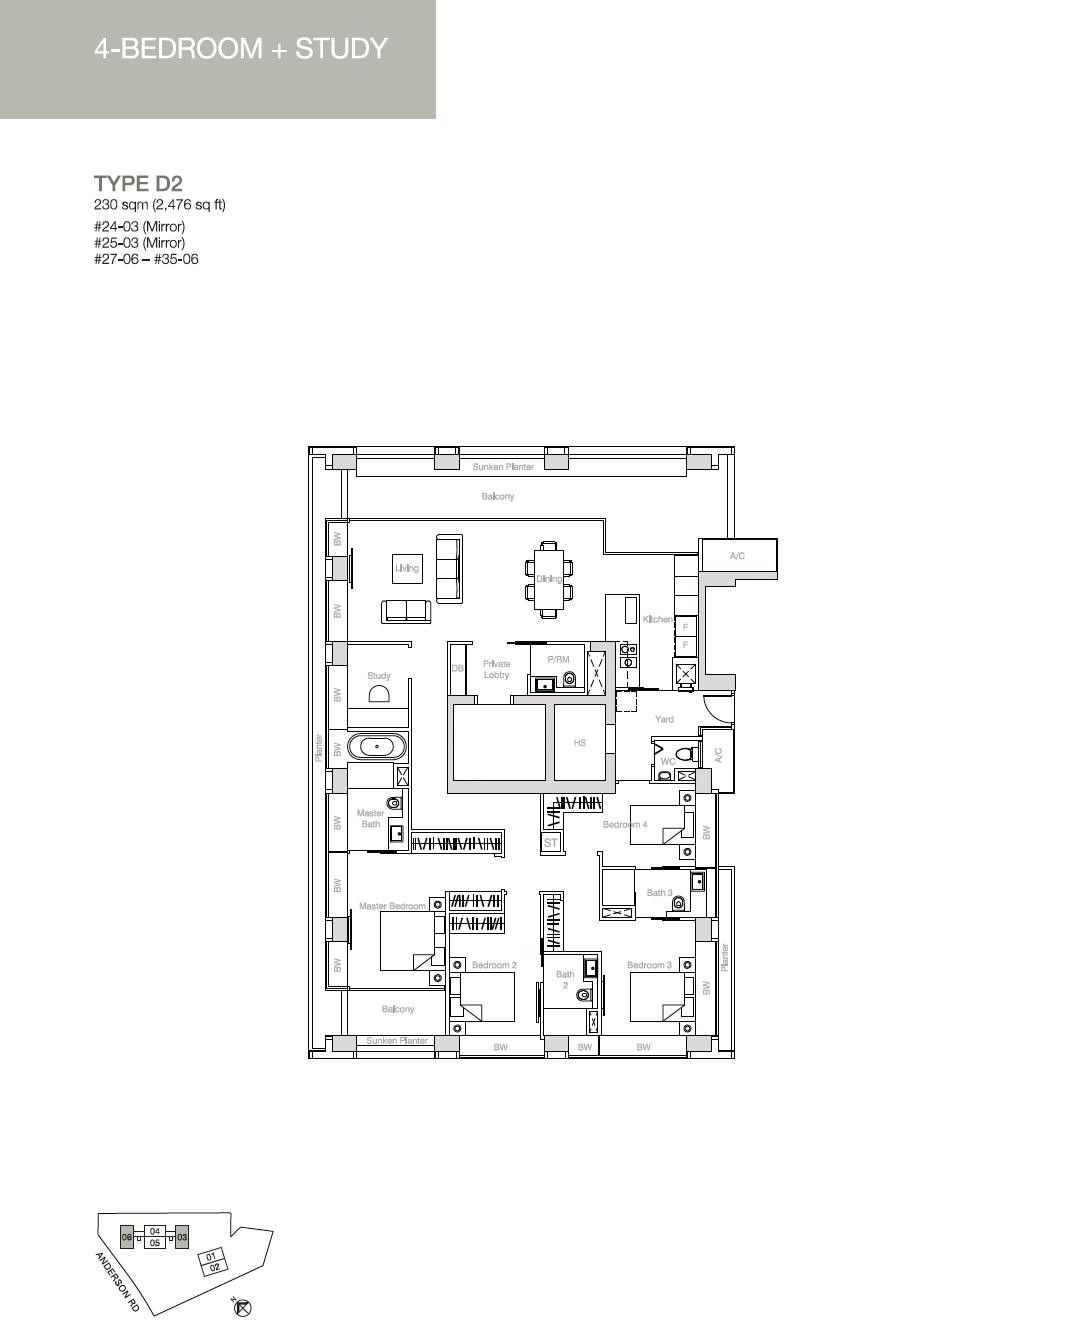 Nouvel-18-floor-plan-4BRStudy